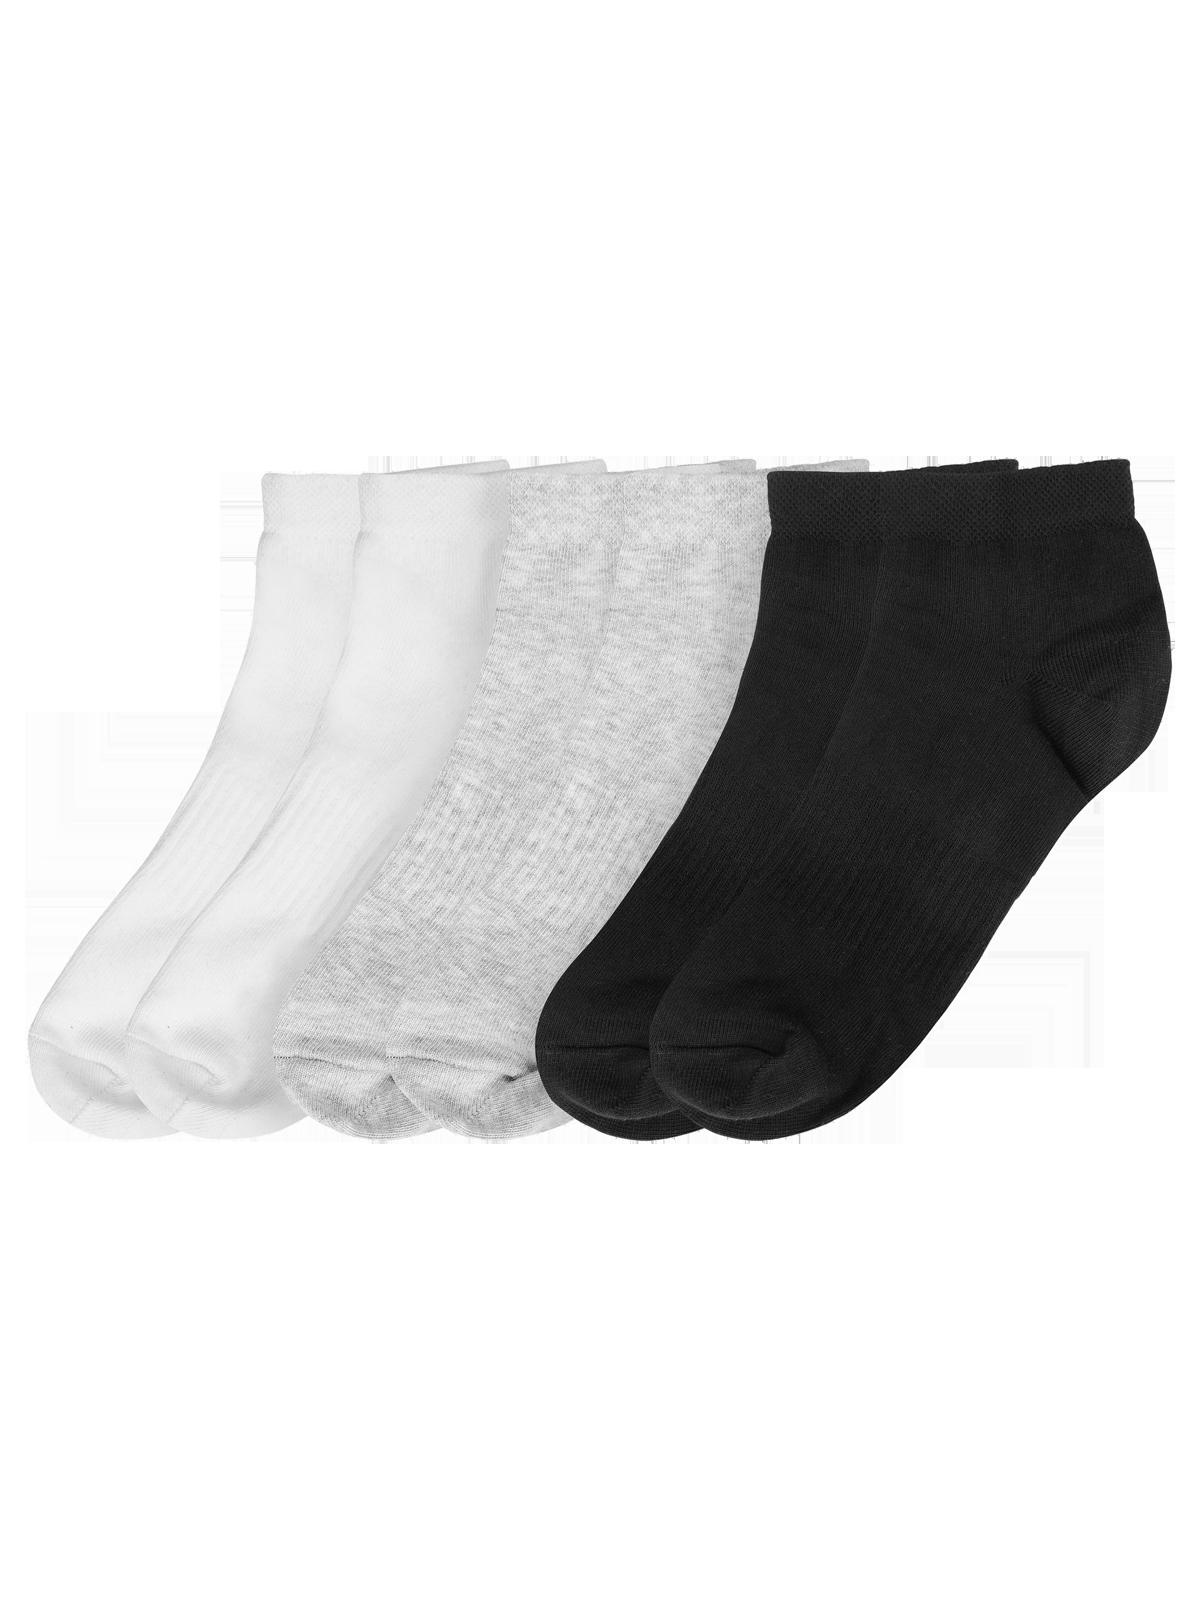 Ankle Socks 6-p Svart/Grå/Vit